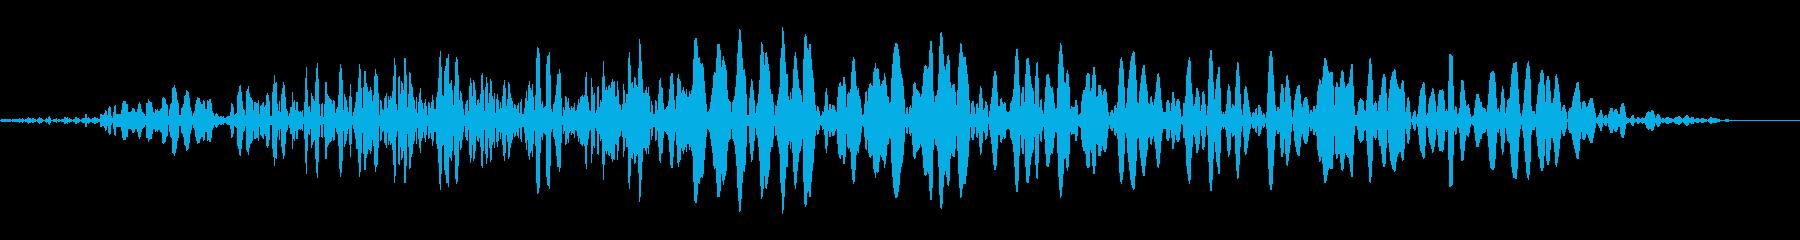 LC IMPフレーム14Cの再生済みの波形